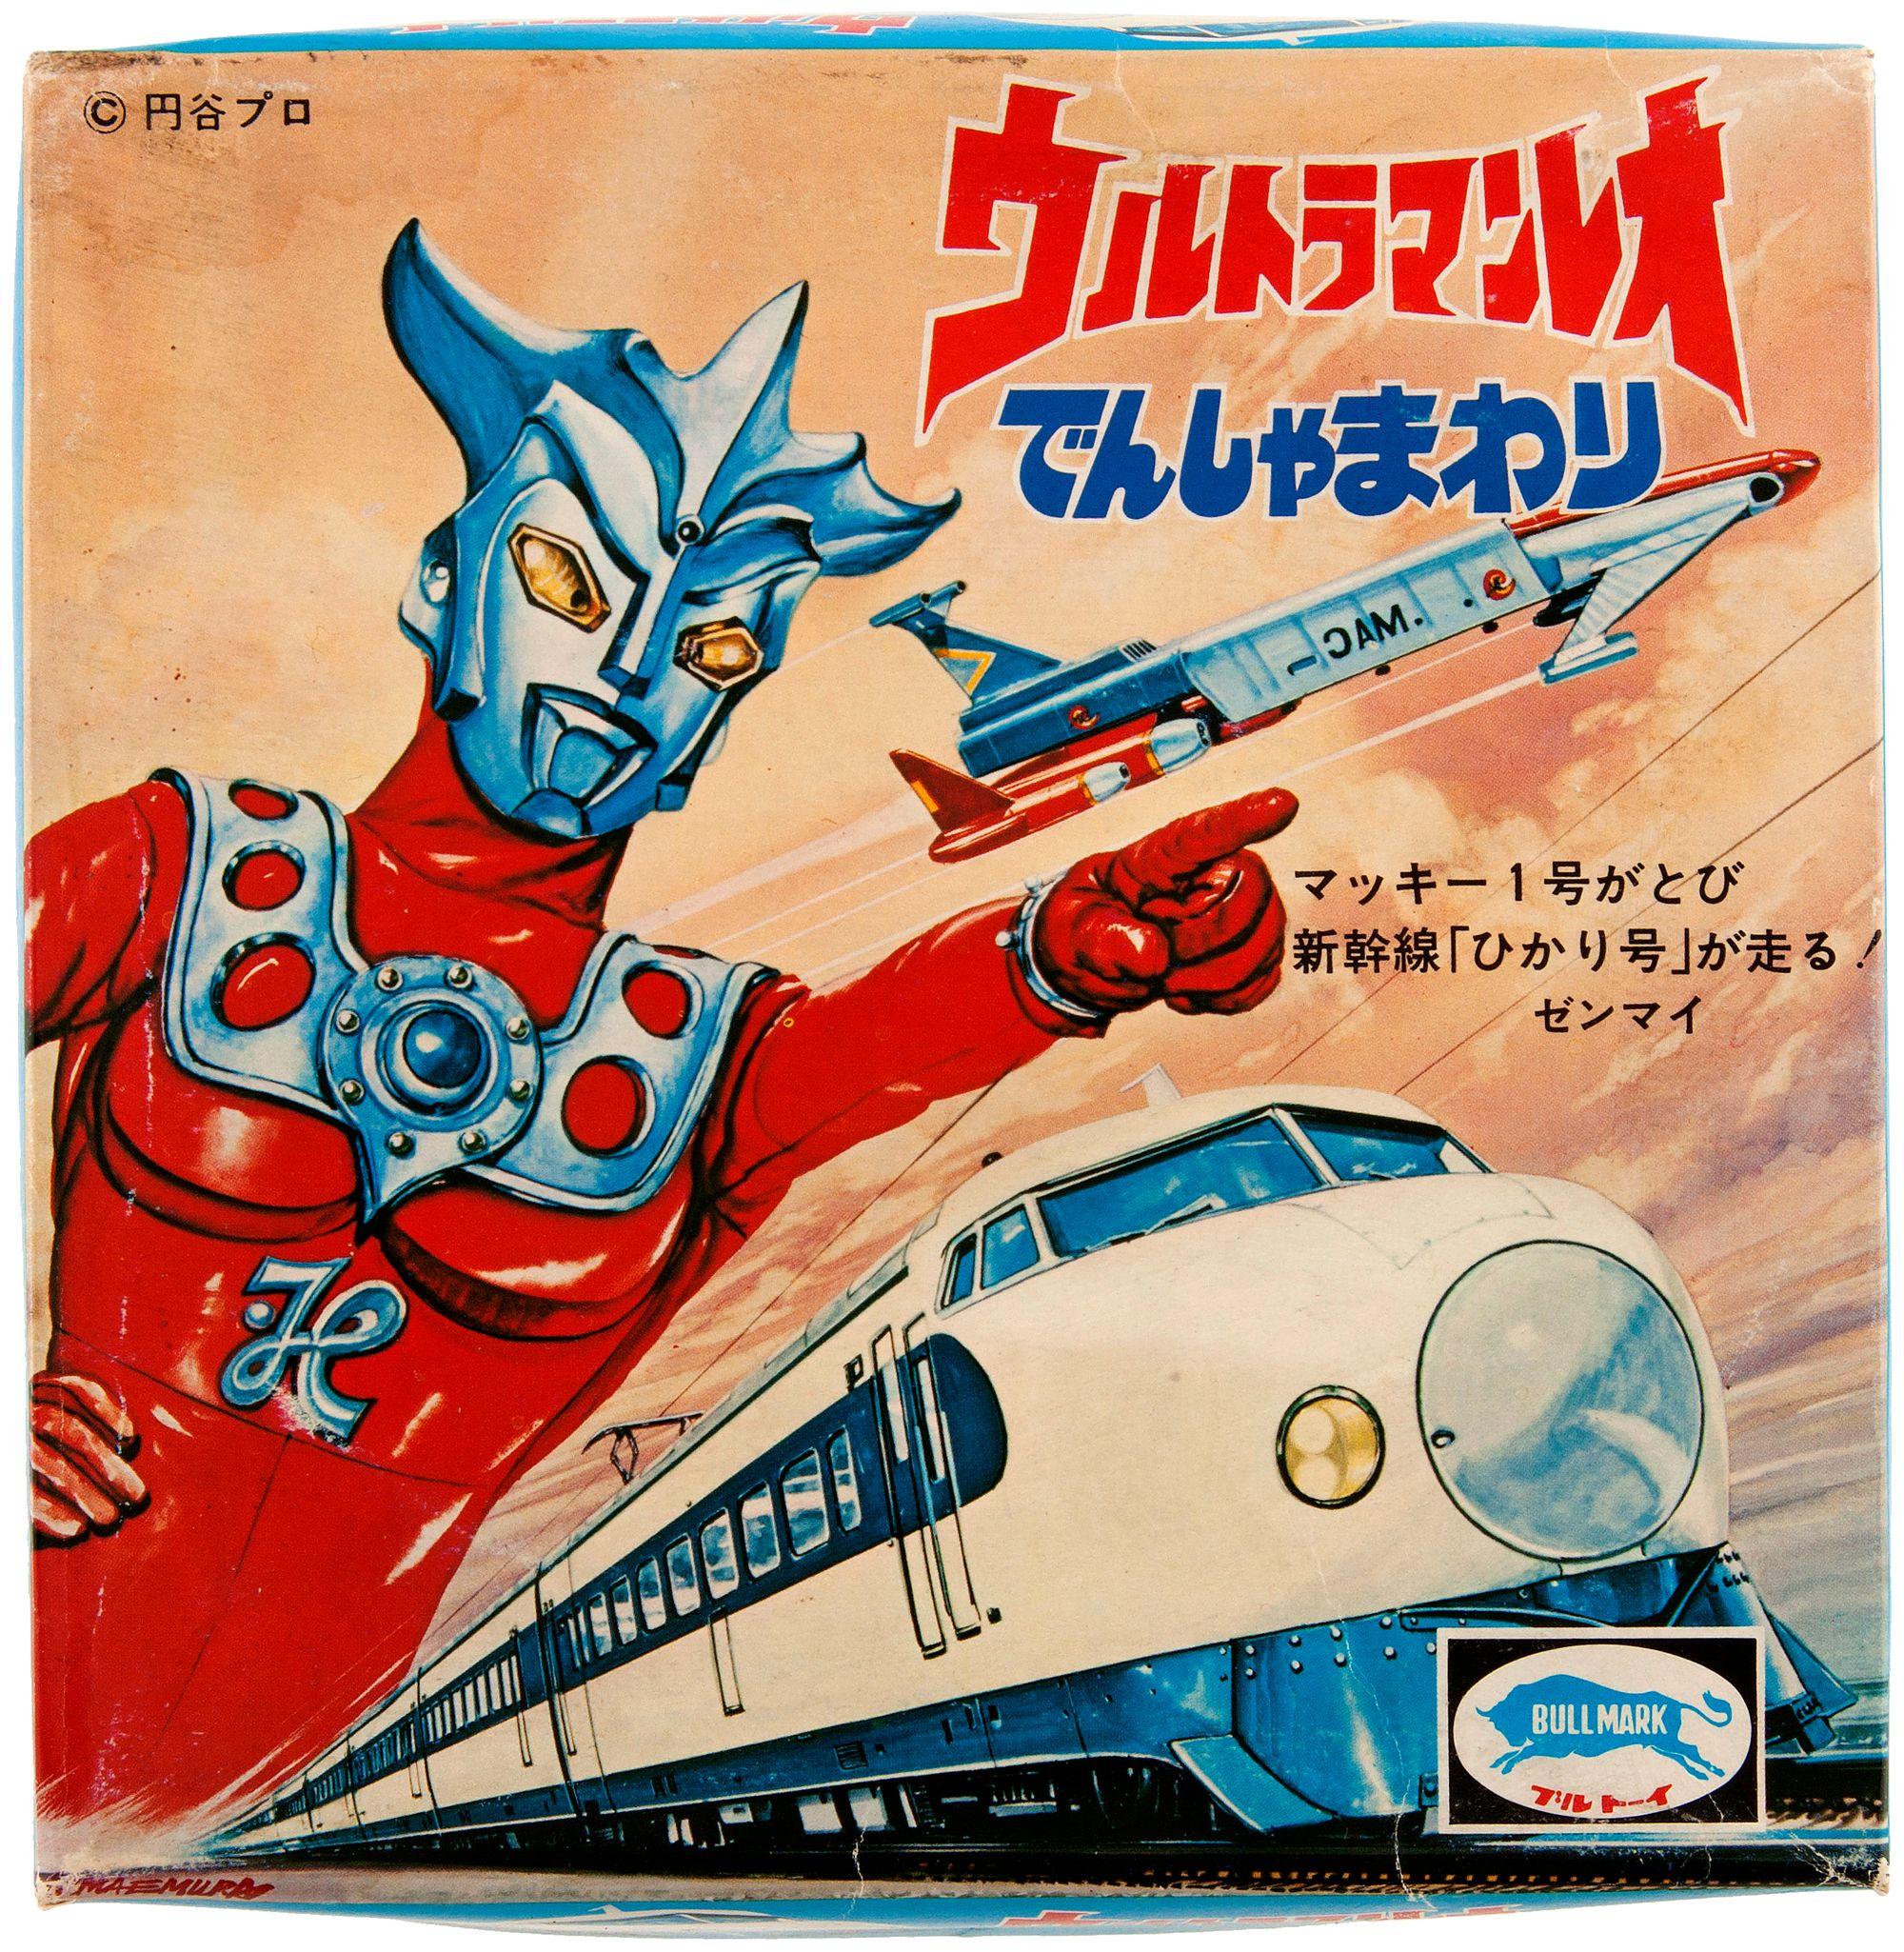 Bullmark Ultraman Leo Express Train Wind-Up Toy